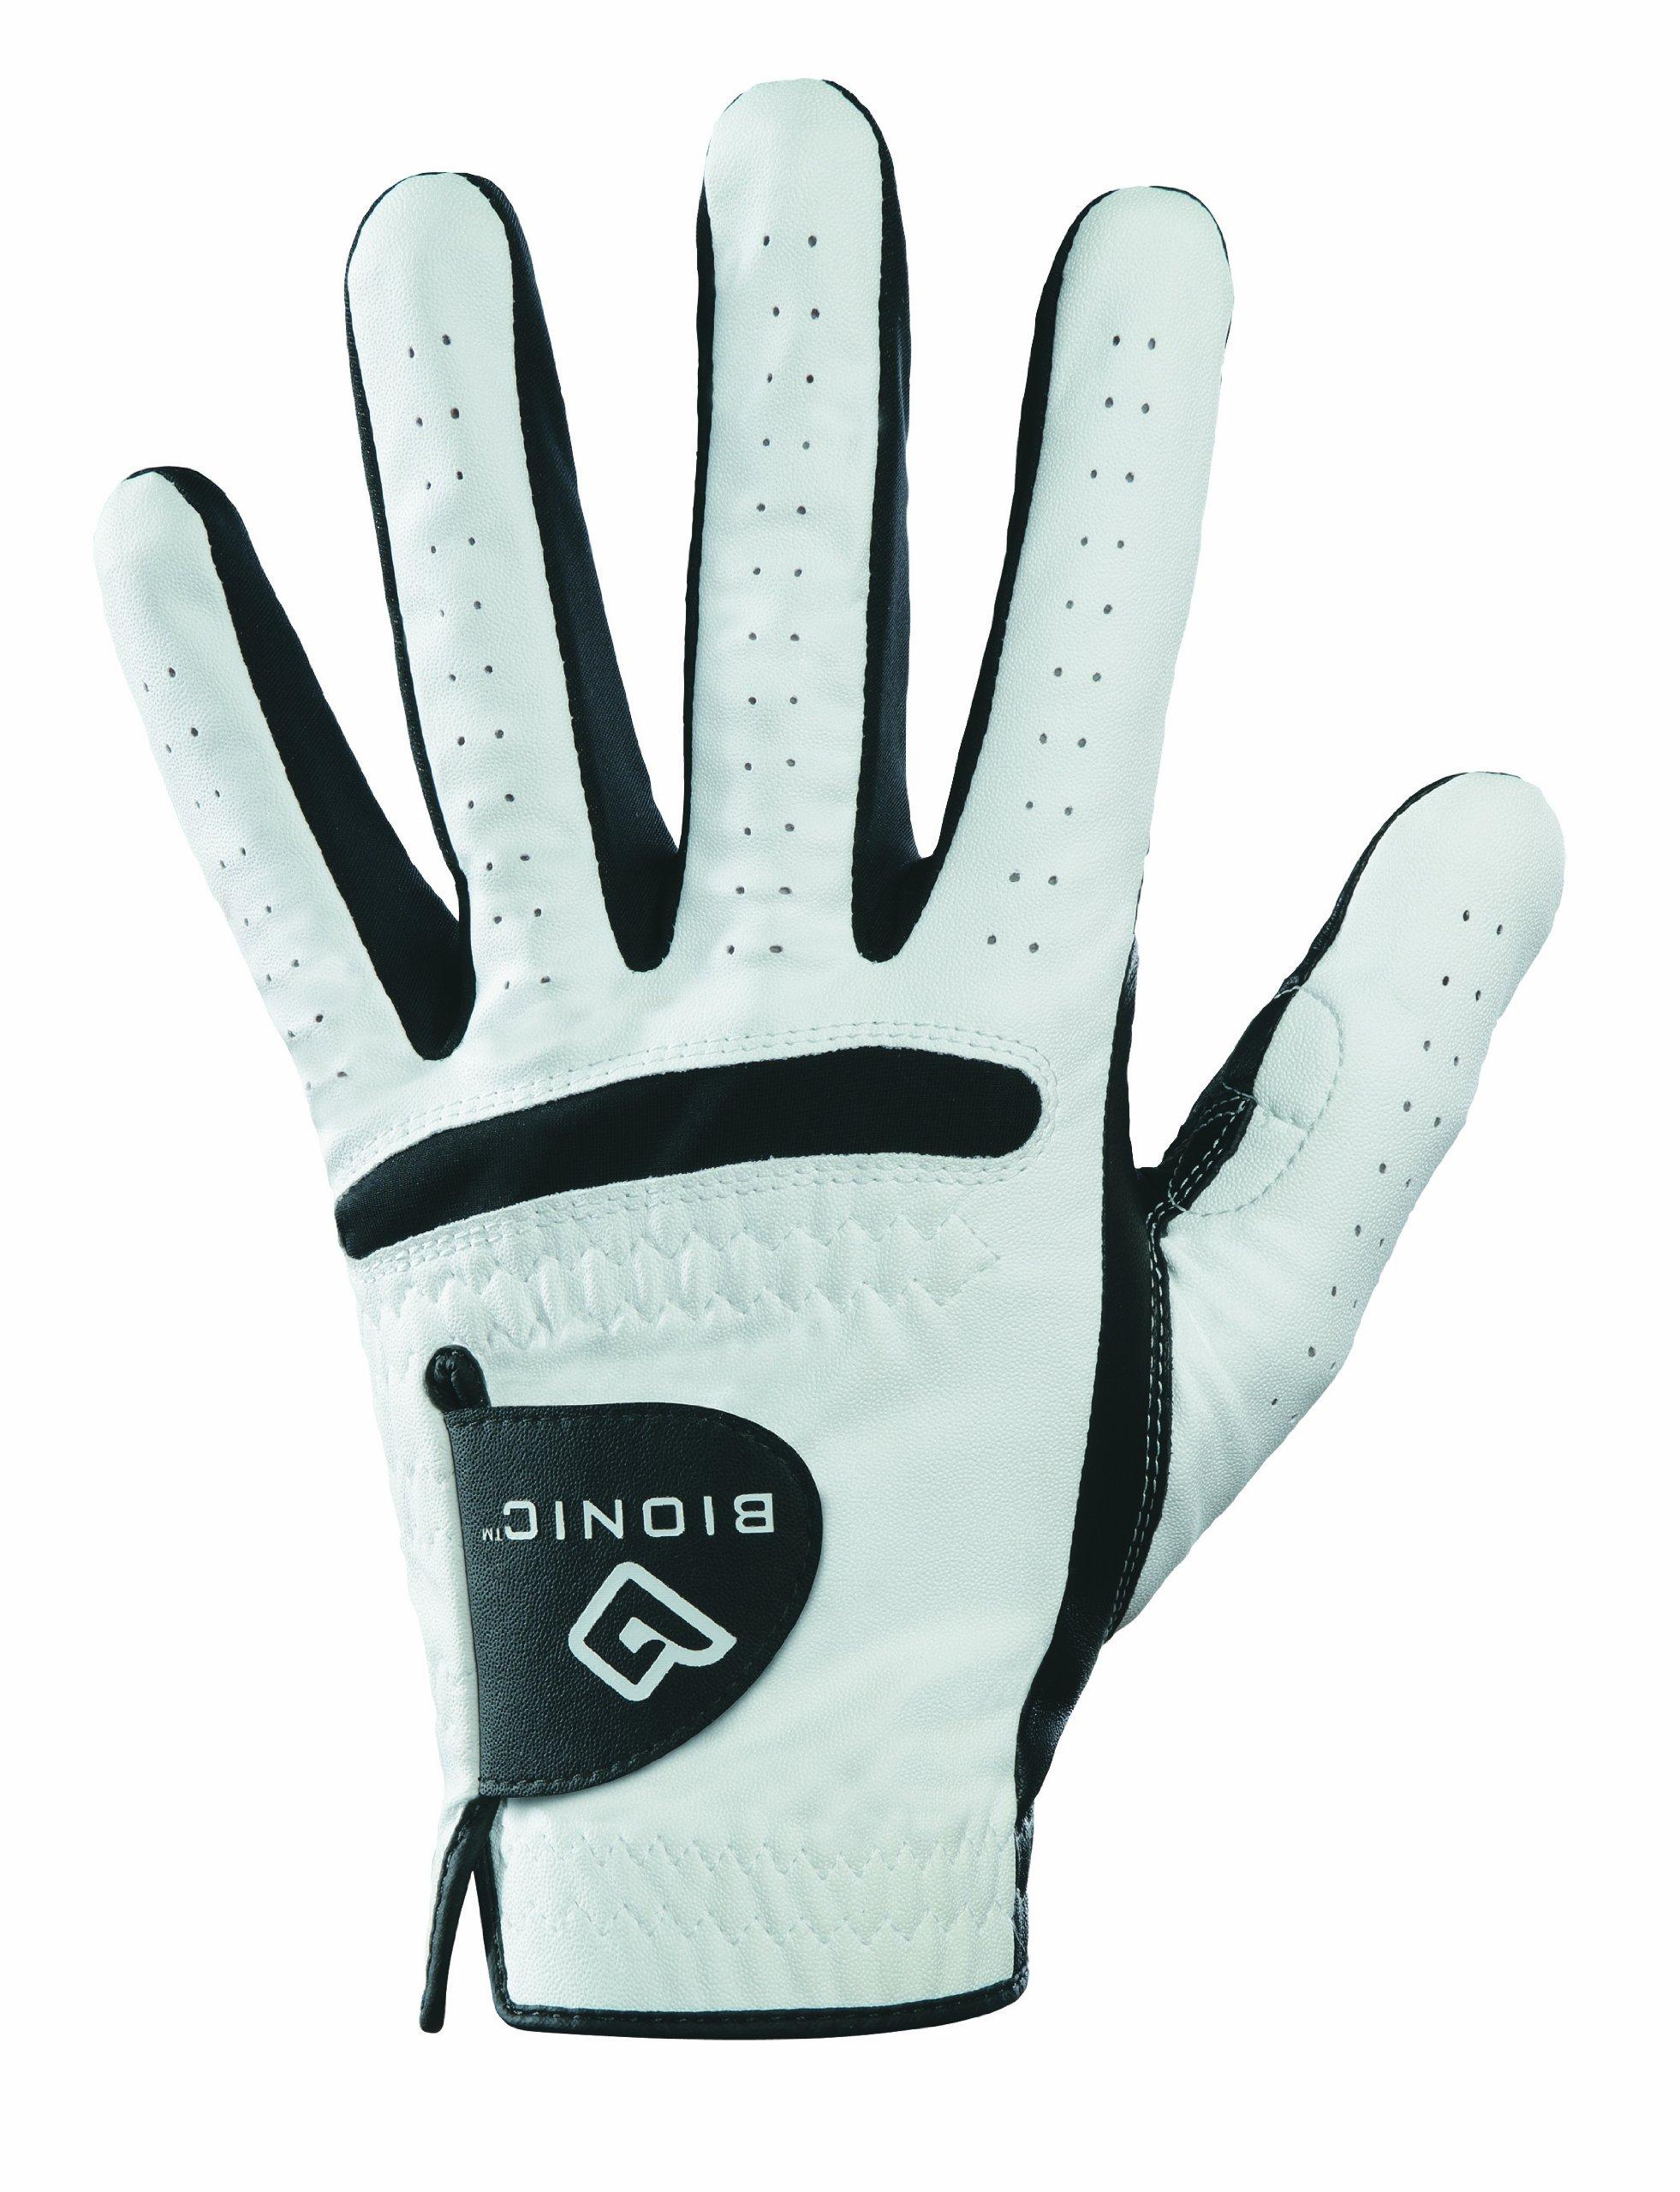 Bionic GGRMLS RelaxGrip Black Palm Golf Glove (Men's, Left Hand, Small)